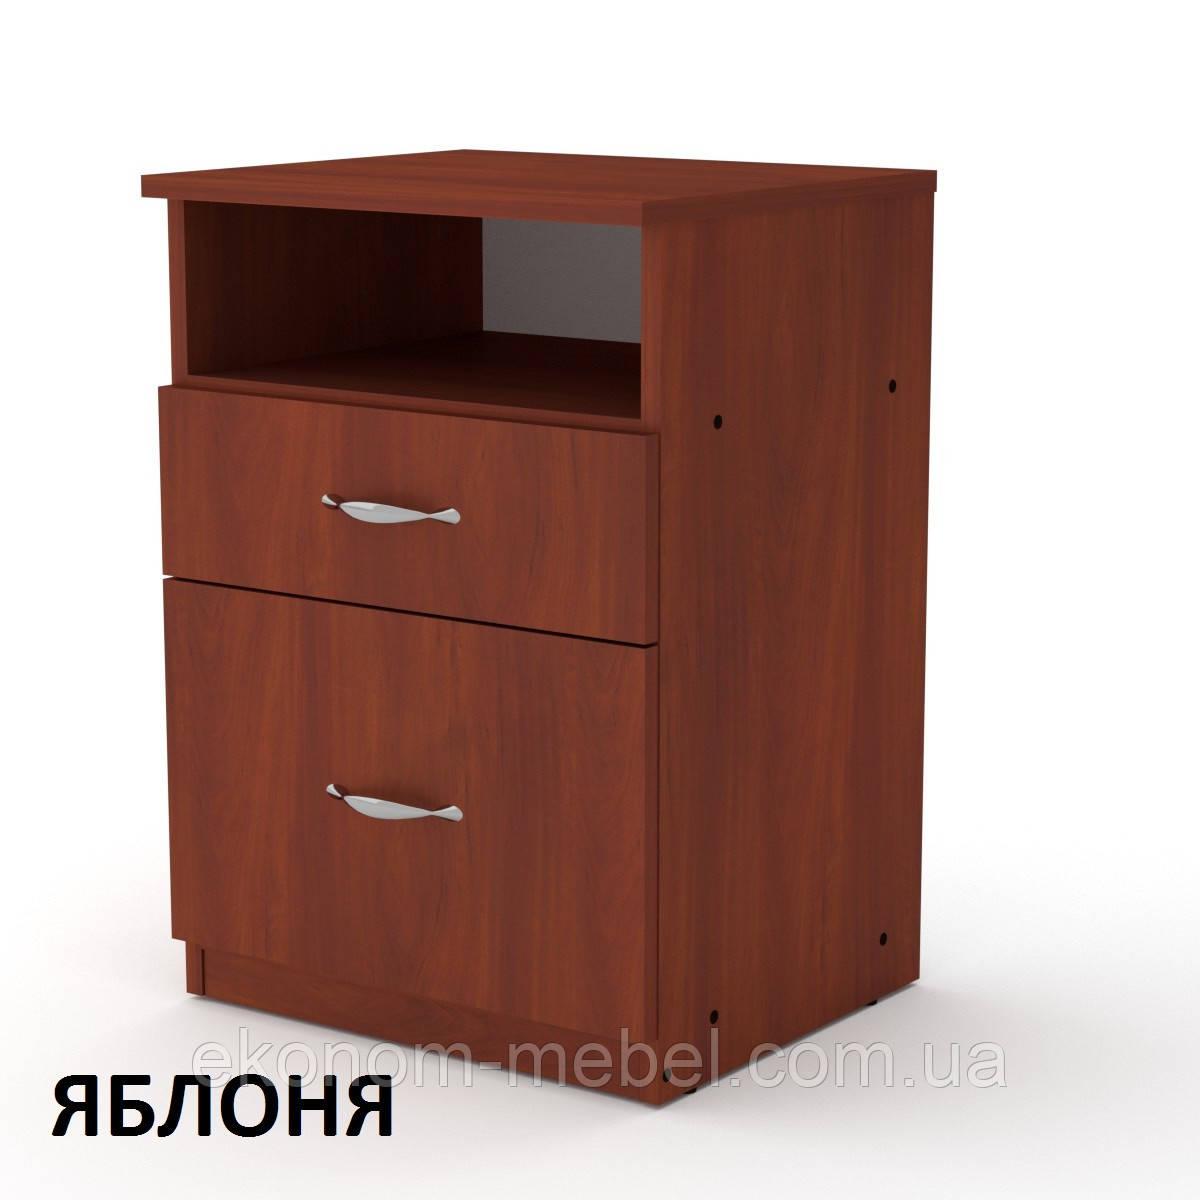 Тумбочка ПКТ-4 Одесса для дома и под офисную технику